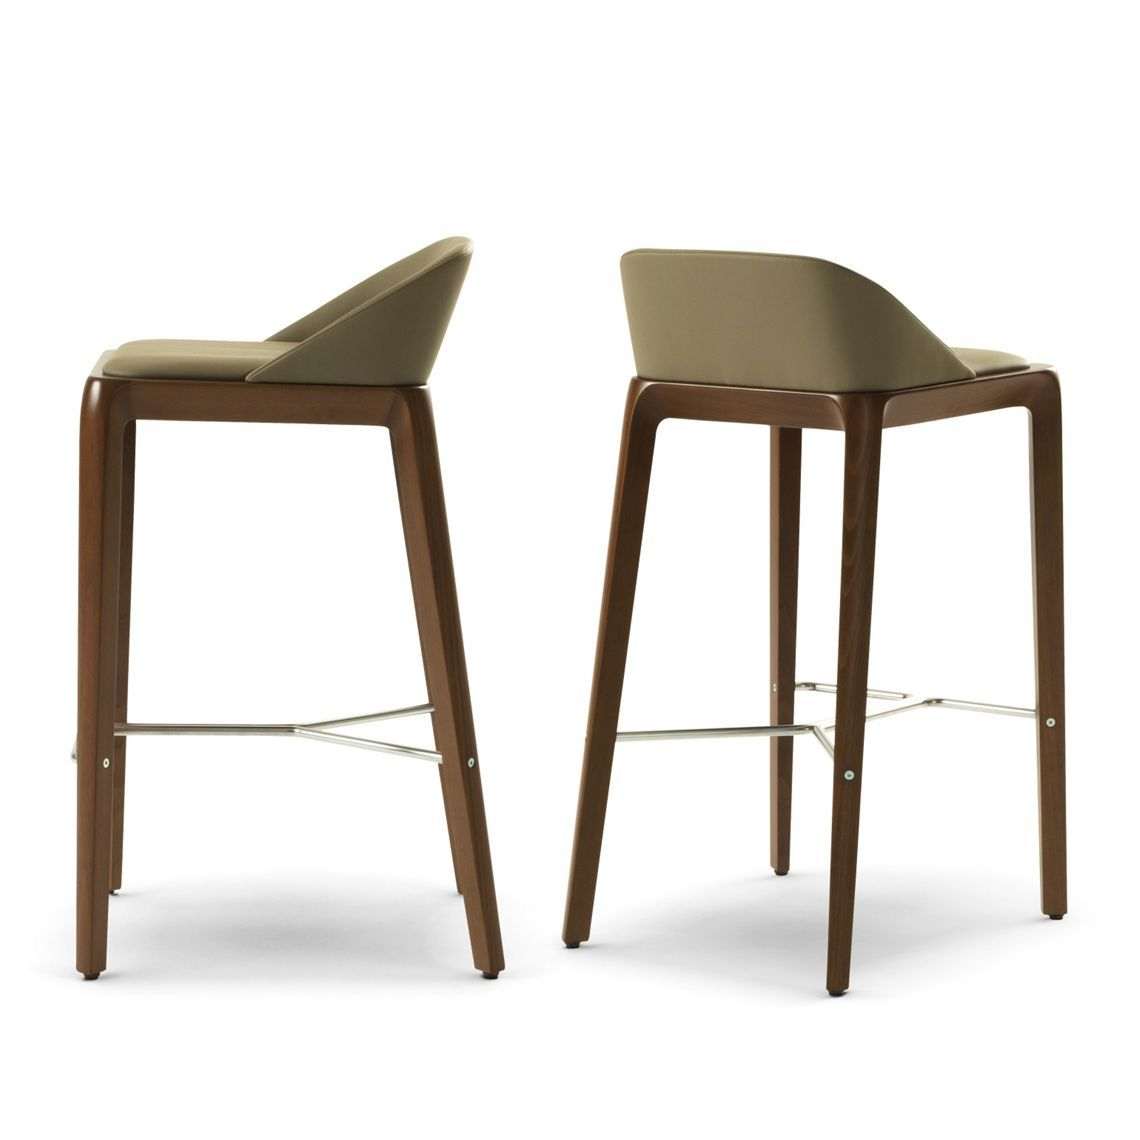 Merveilleux BRIO Bar Stool (CHAIRS, STOOLS, BENCHES)   Roche Bobois